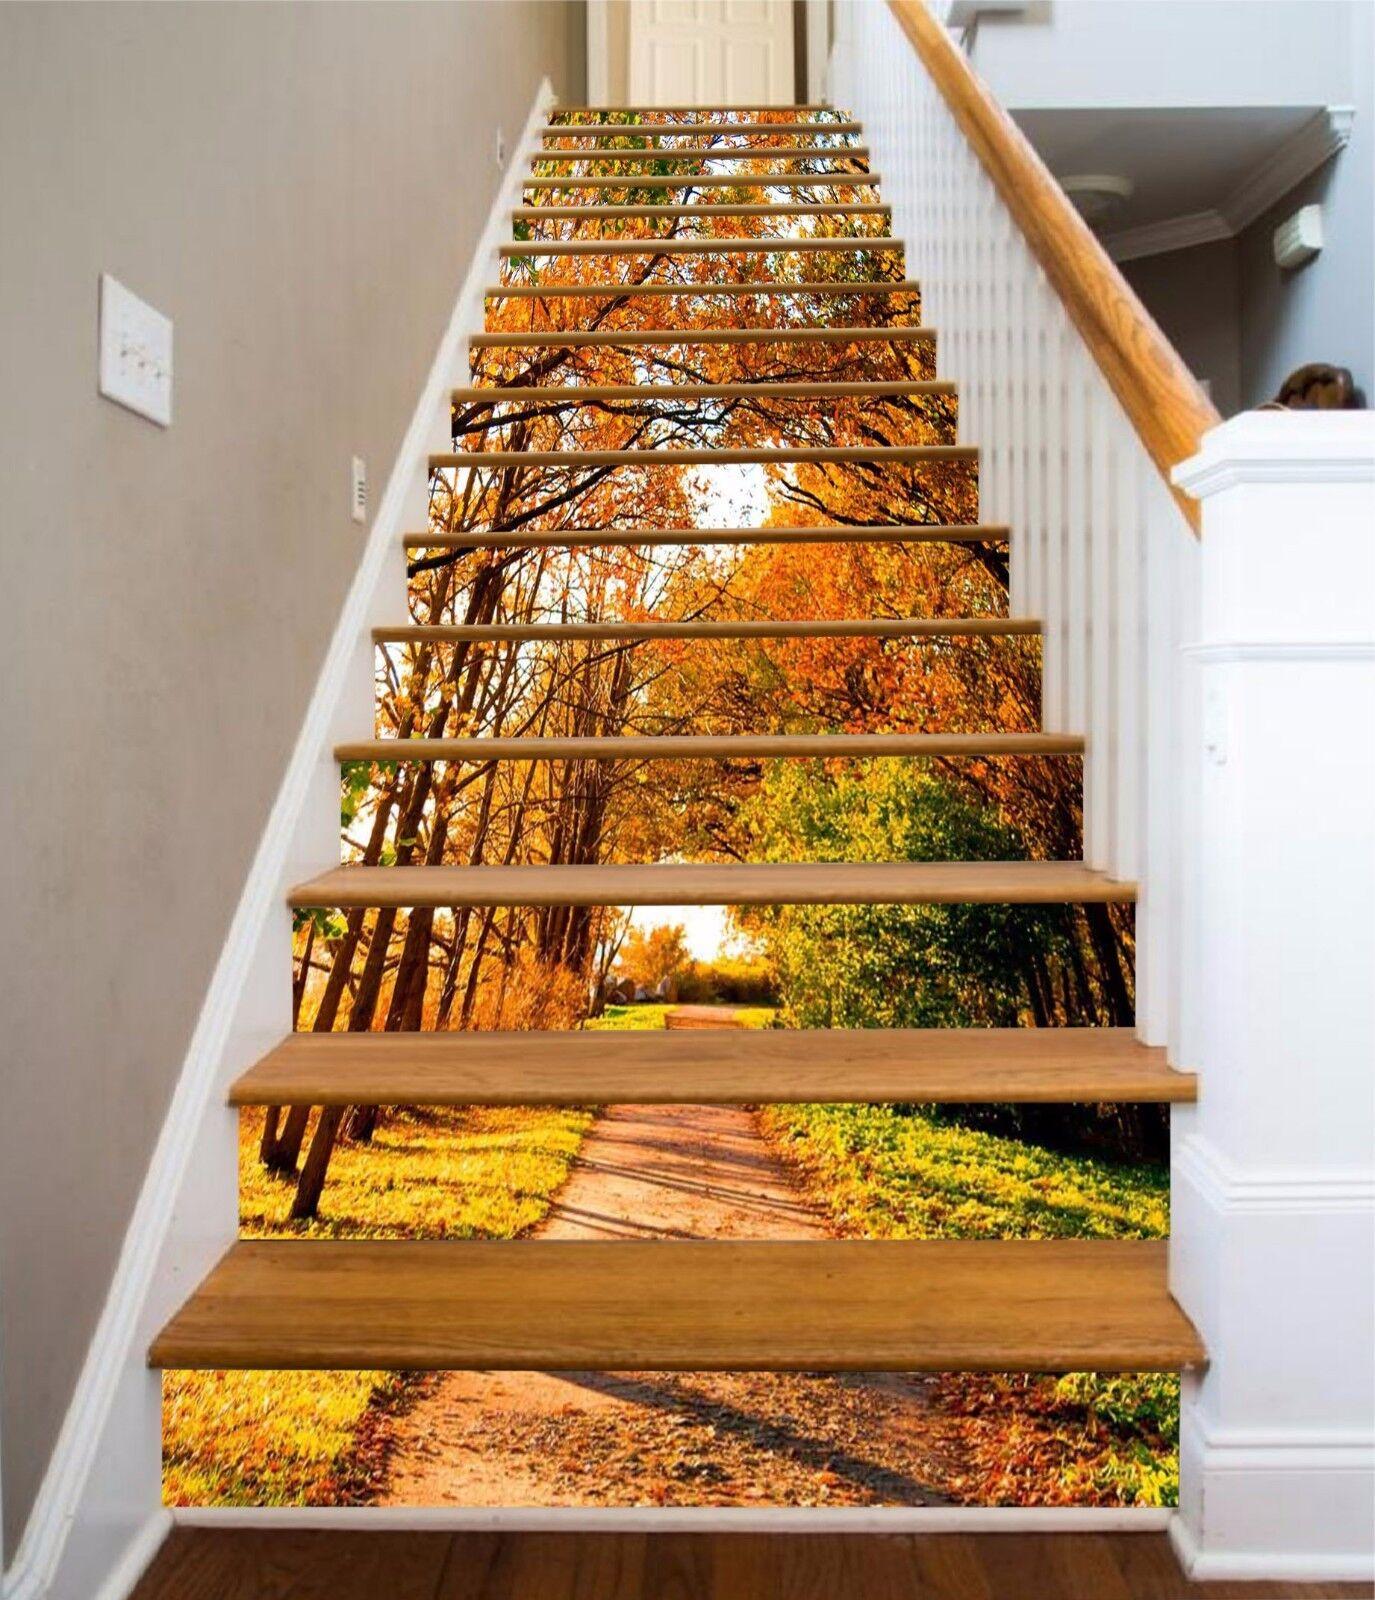 3D Strae Baum 9308 Stair Risers Dekoration Fototapete Vinyl Aufkleber Tapete DE